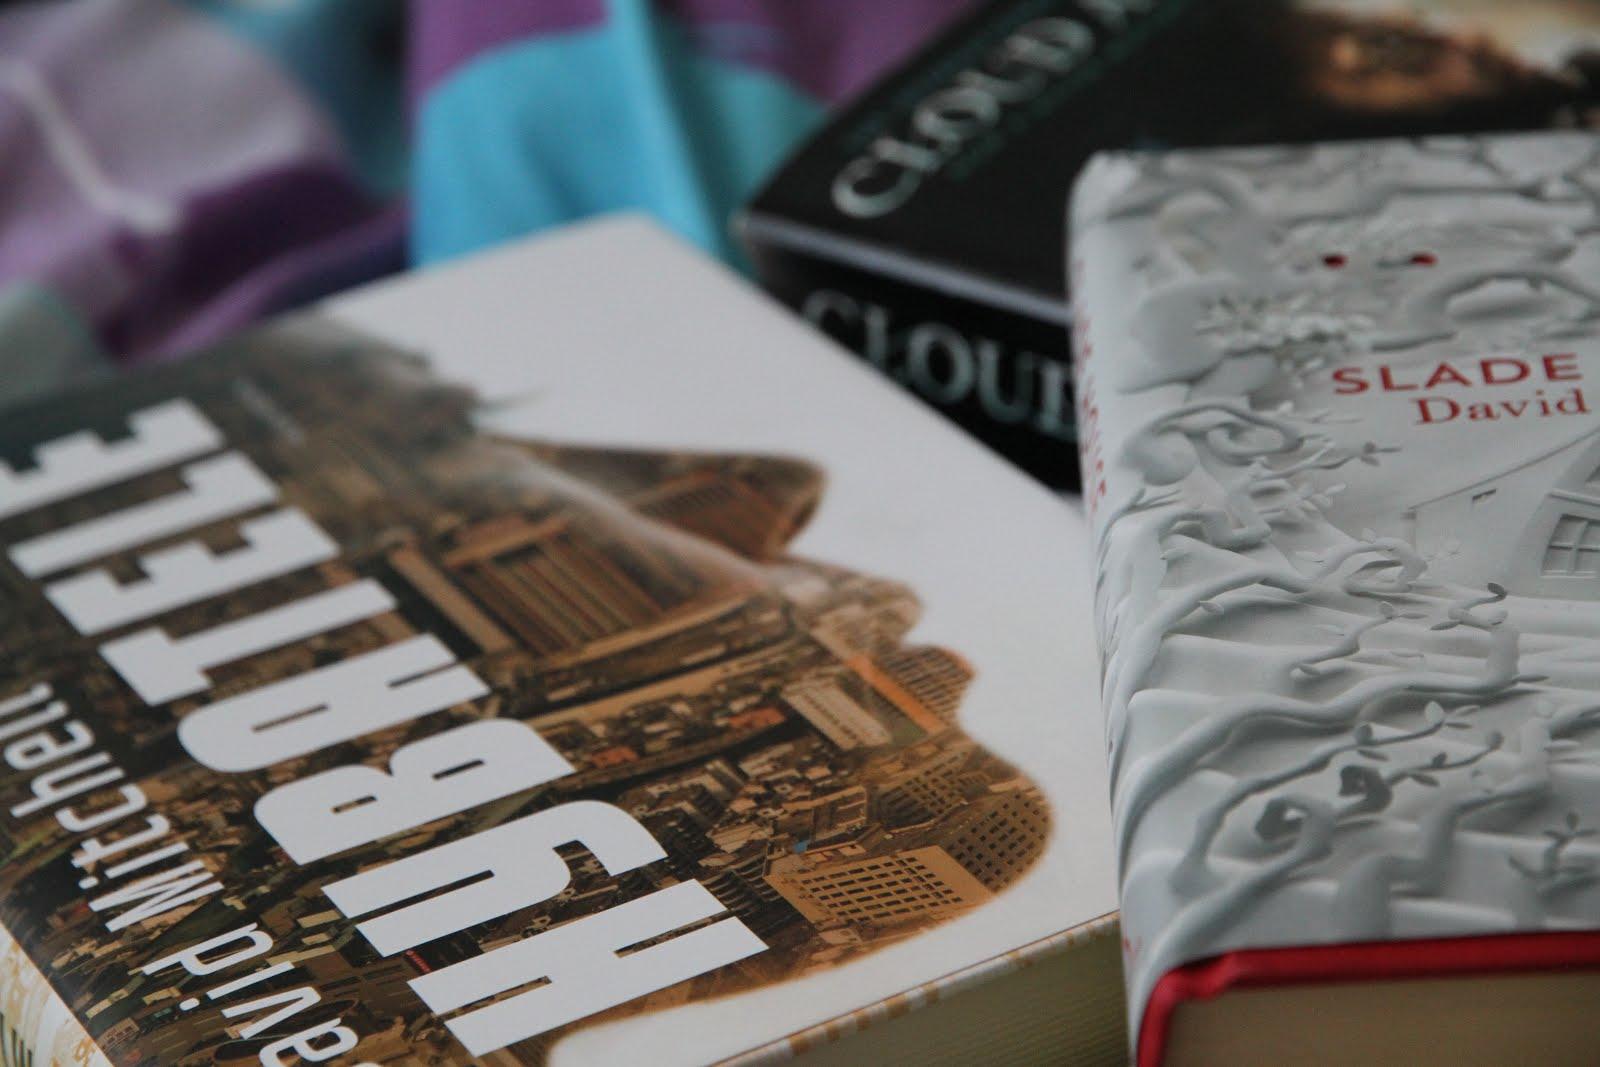 Will read